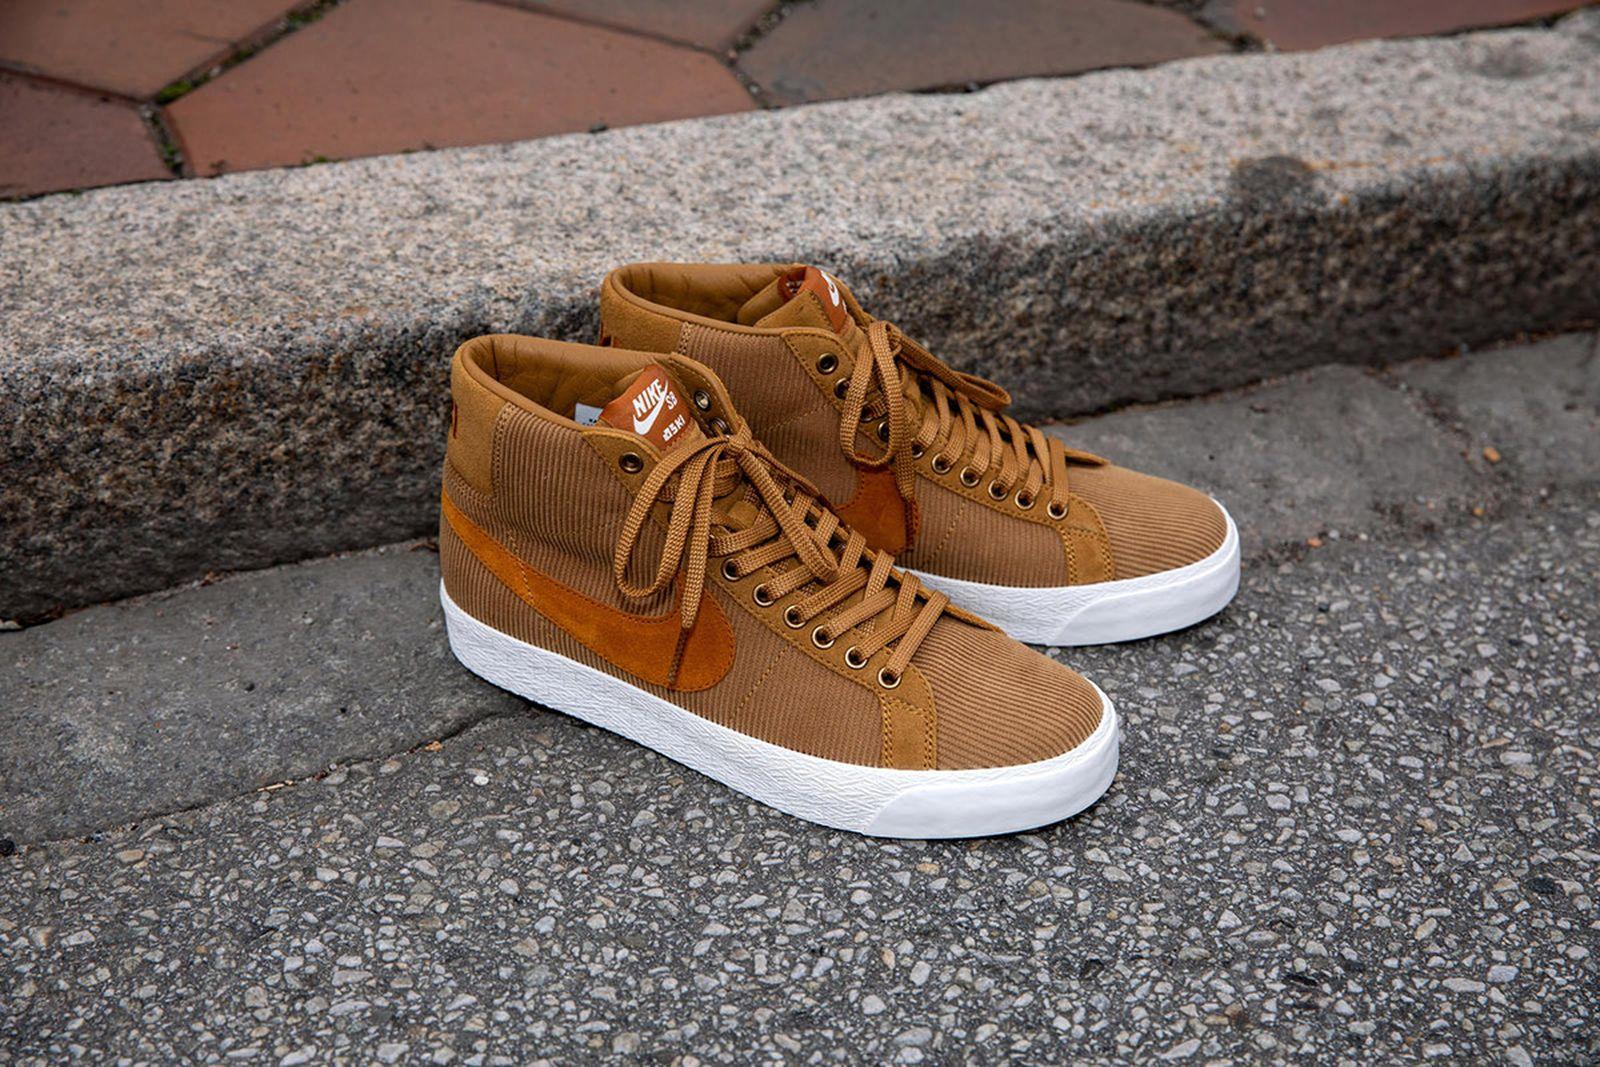 Nike SB Oski Orange Label Blazer